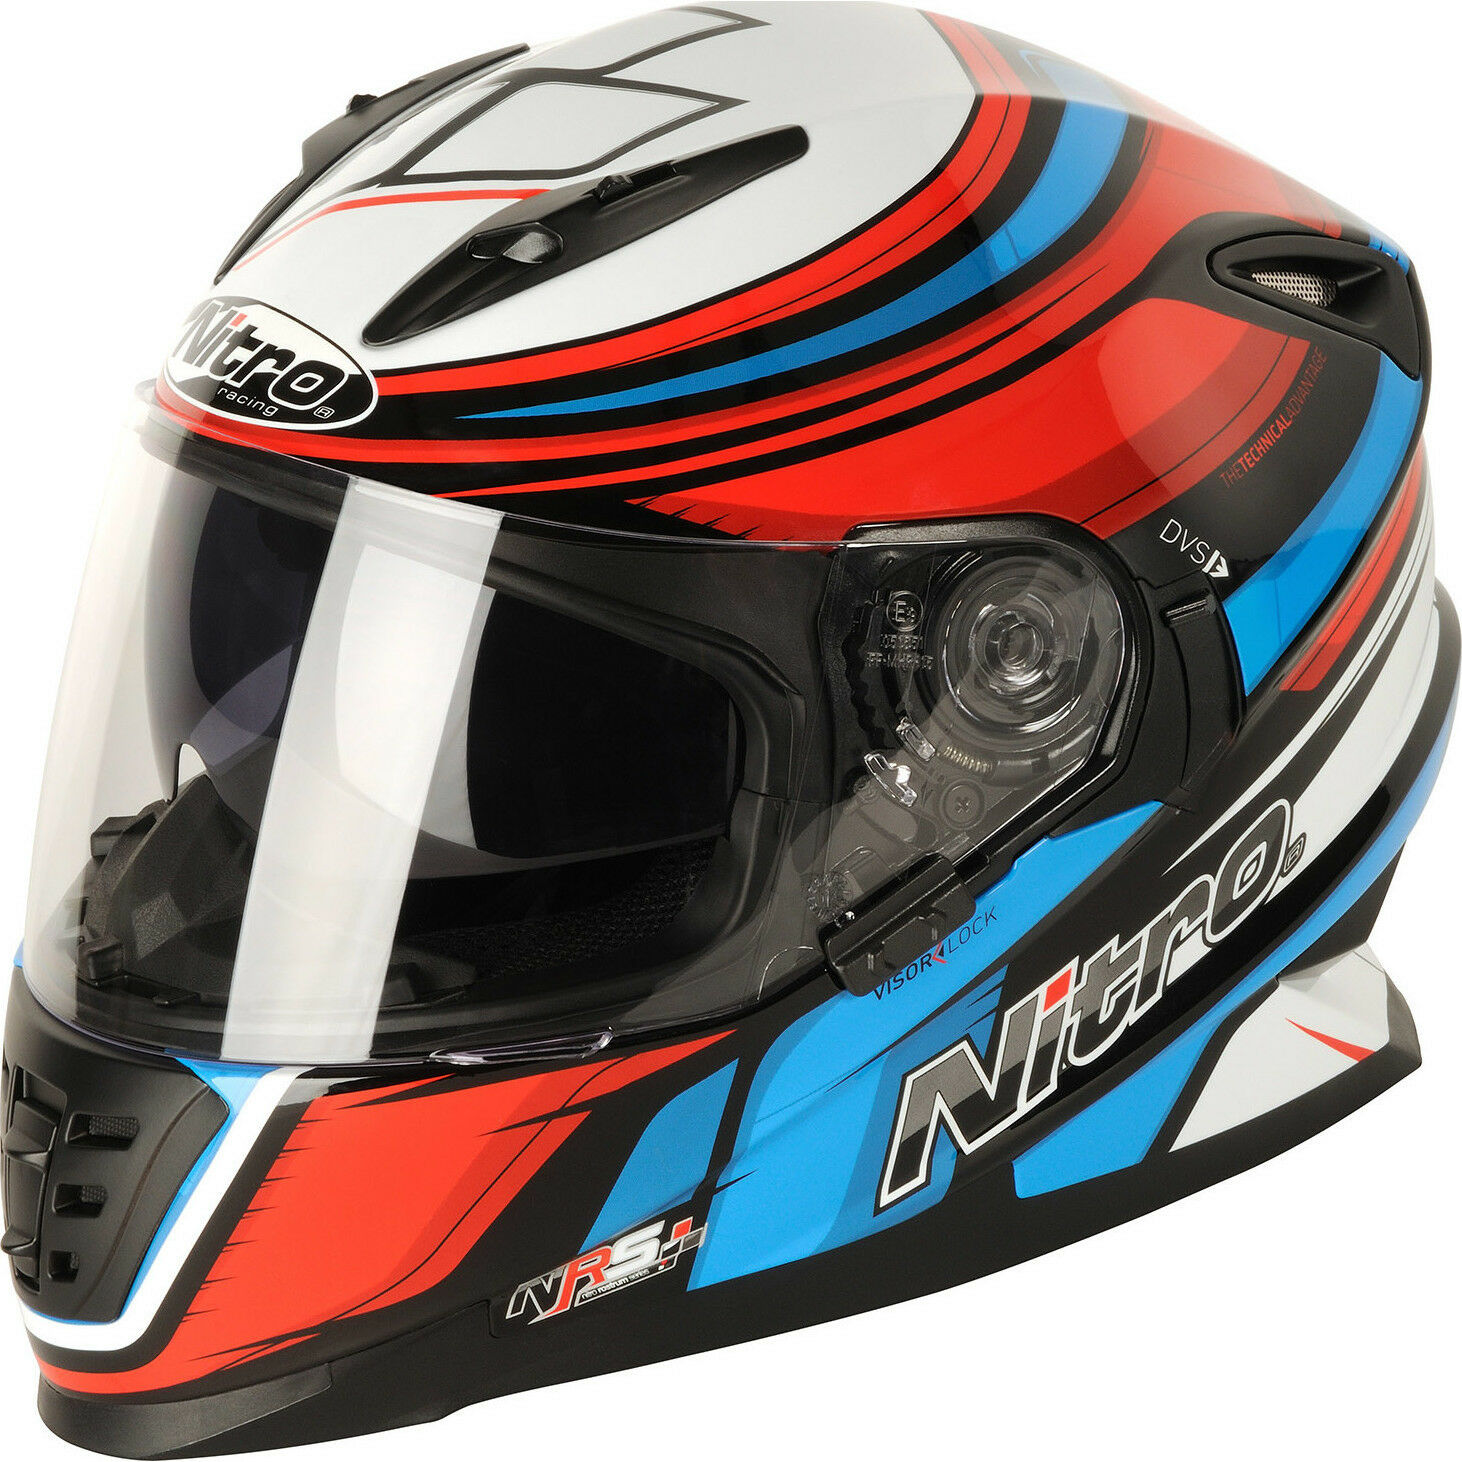 \NITRO NRS-01 TORQUE FULL FACE MOTORCYCLE HELMET SUN VISOR ACU GOLD ALL SIZES